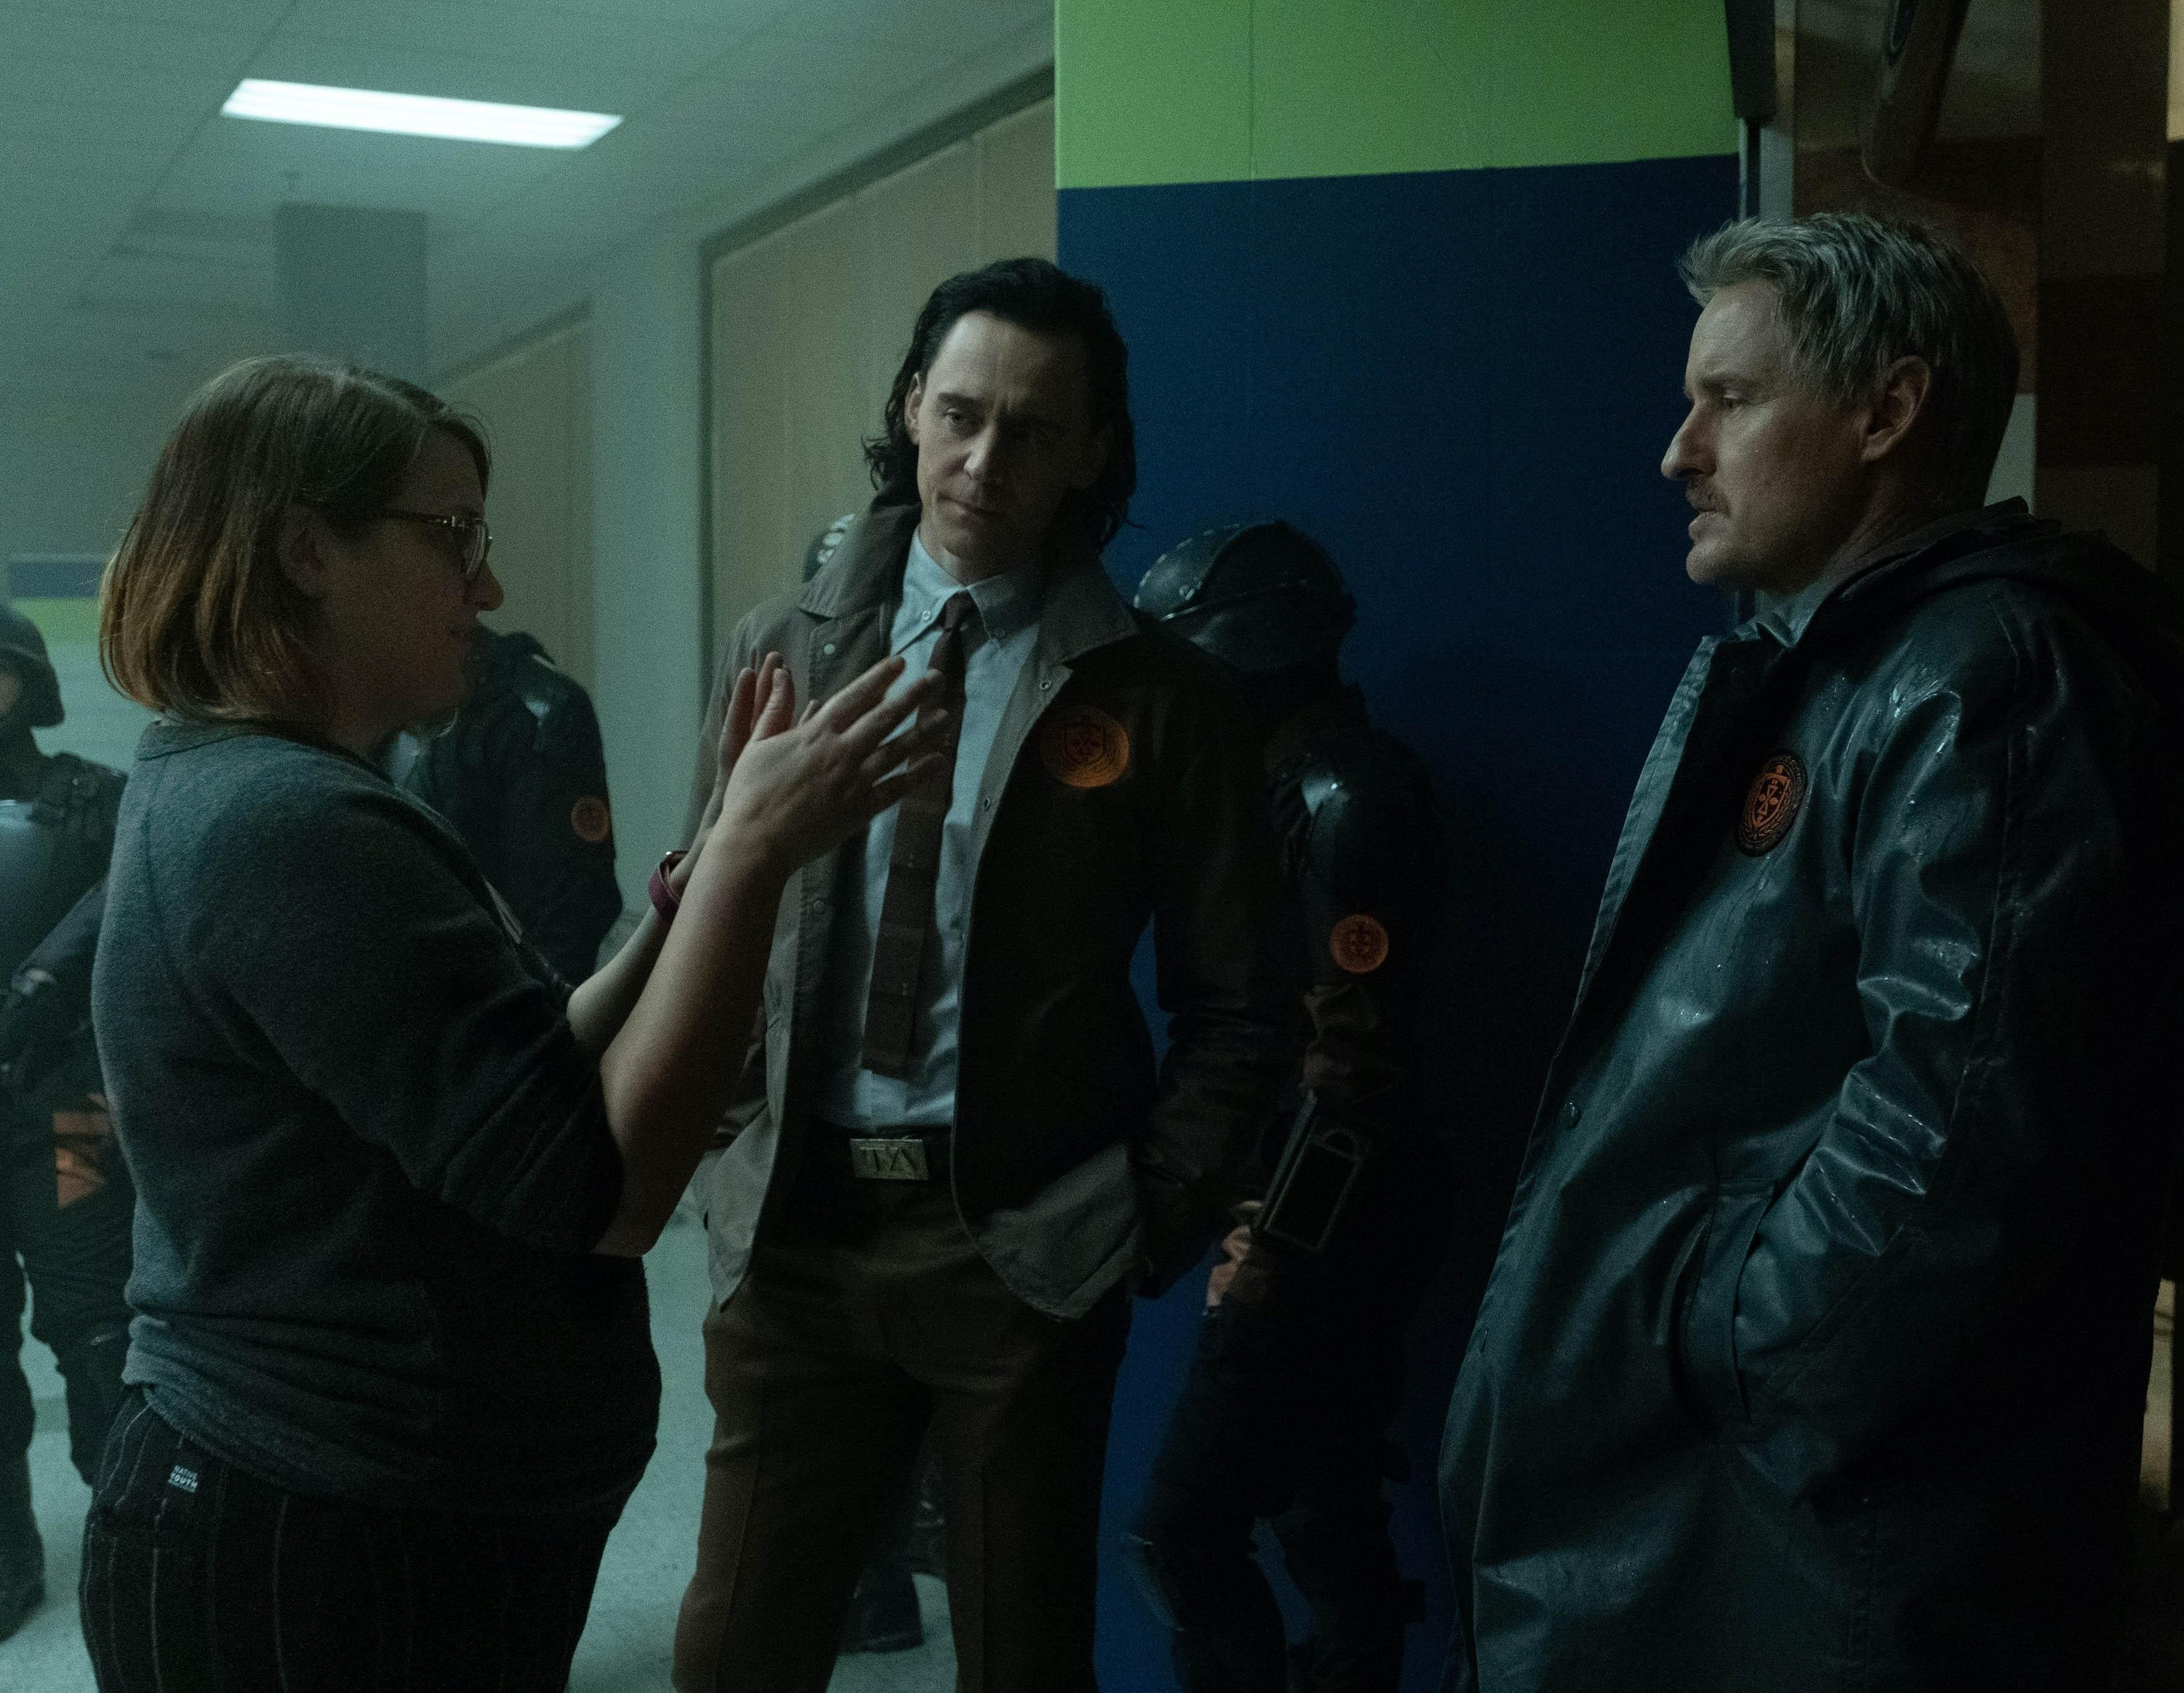 Kate Herron, Tom Hiddleston, and Owen Wilson on the set of Marvel's Loki